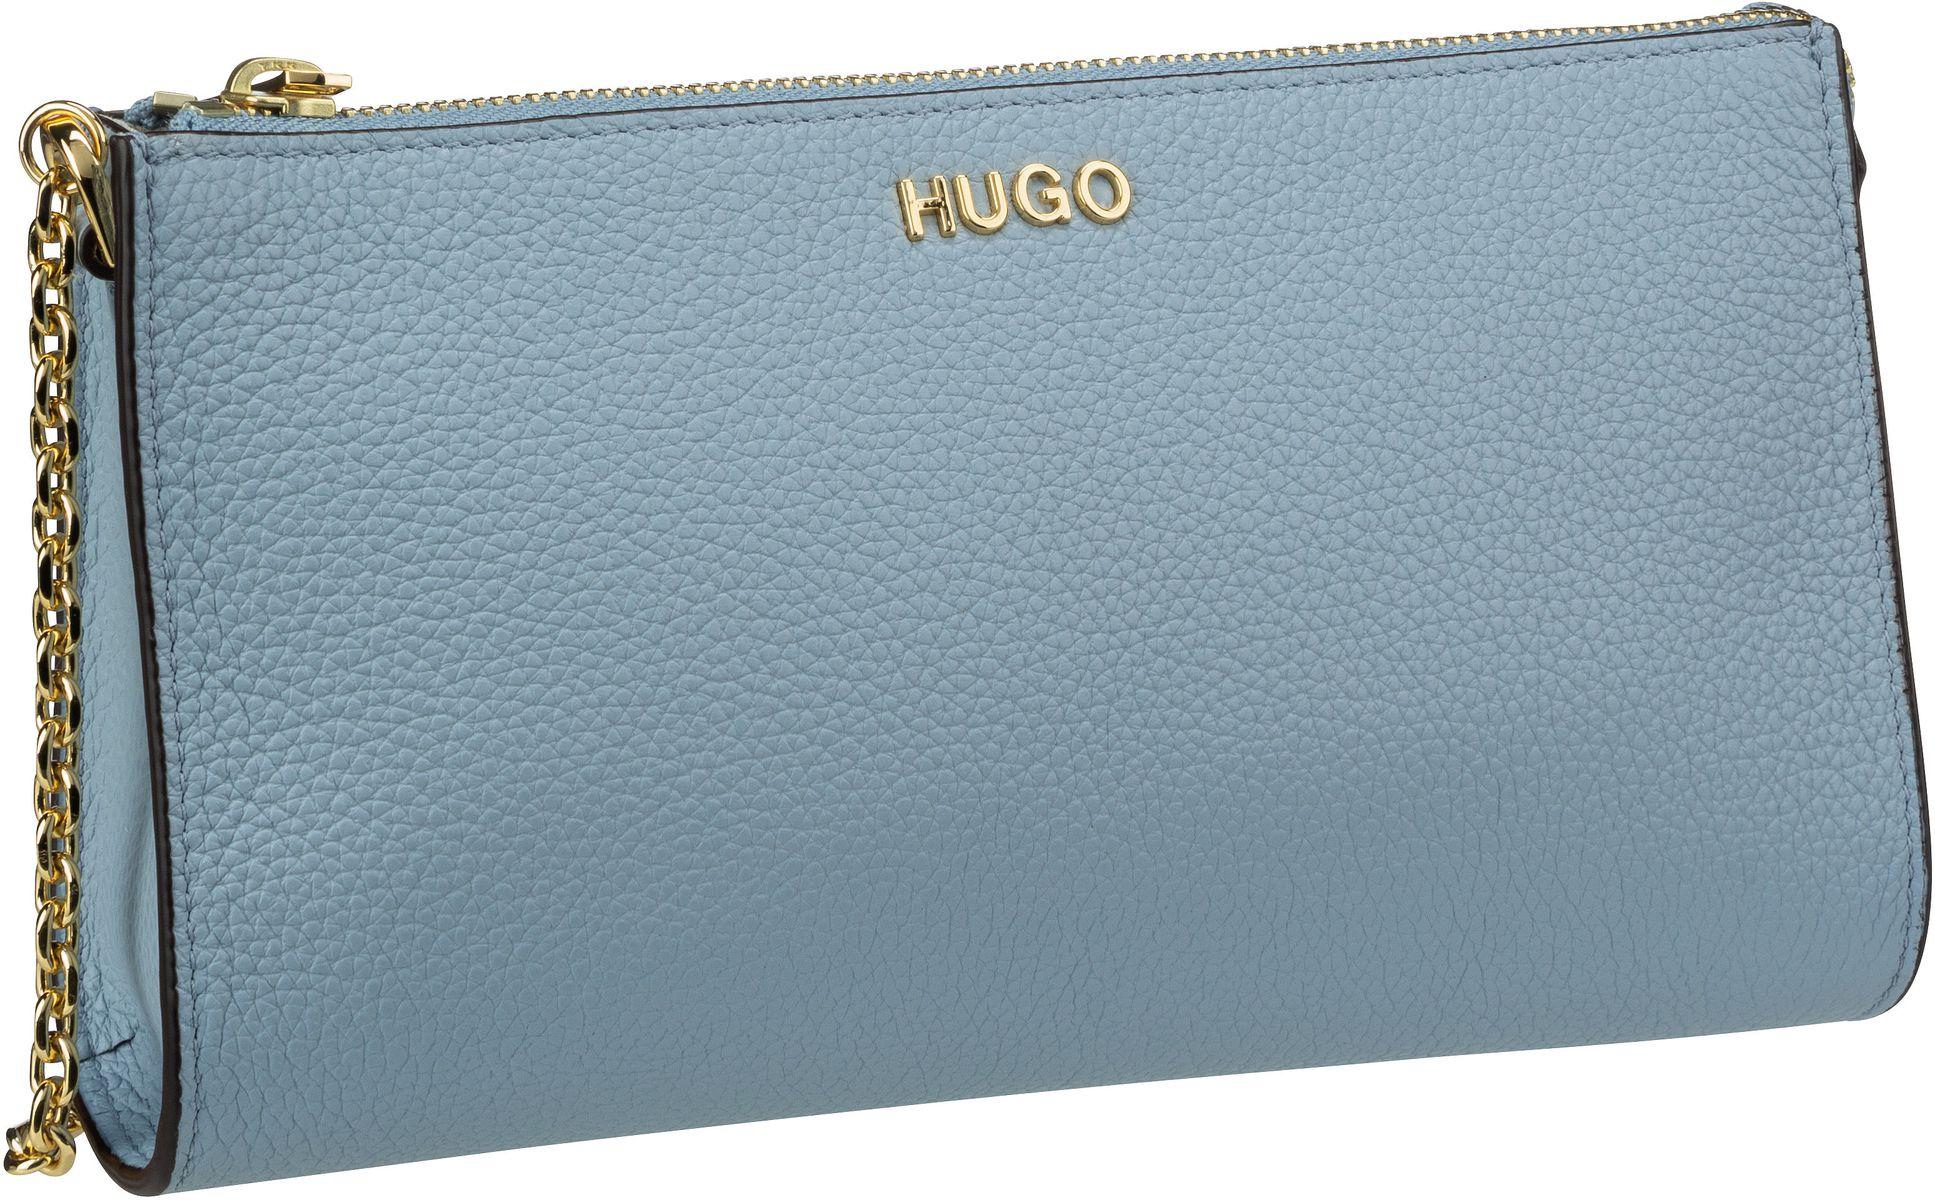 HUGO Umhängetasche Victoria Mini Bag 428525 Light/Pastel Blue